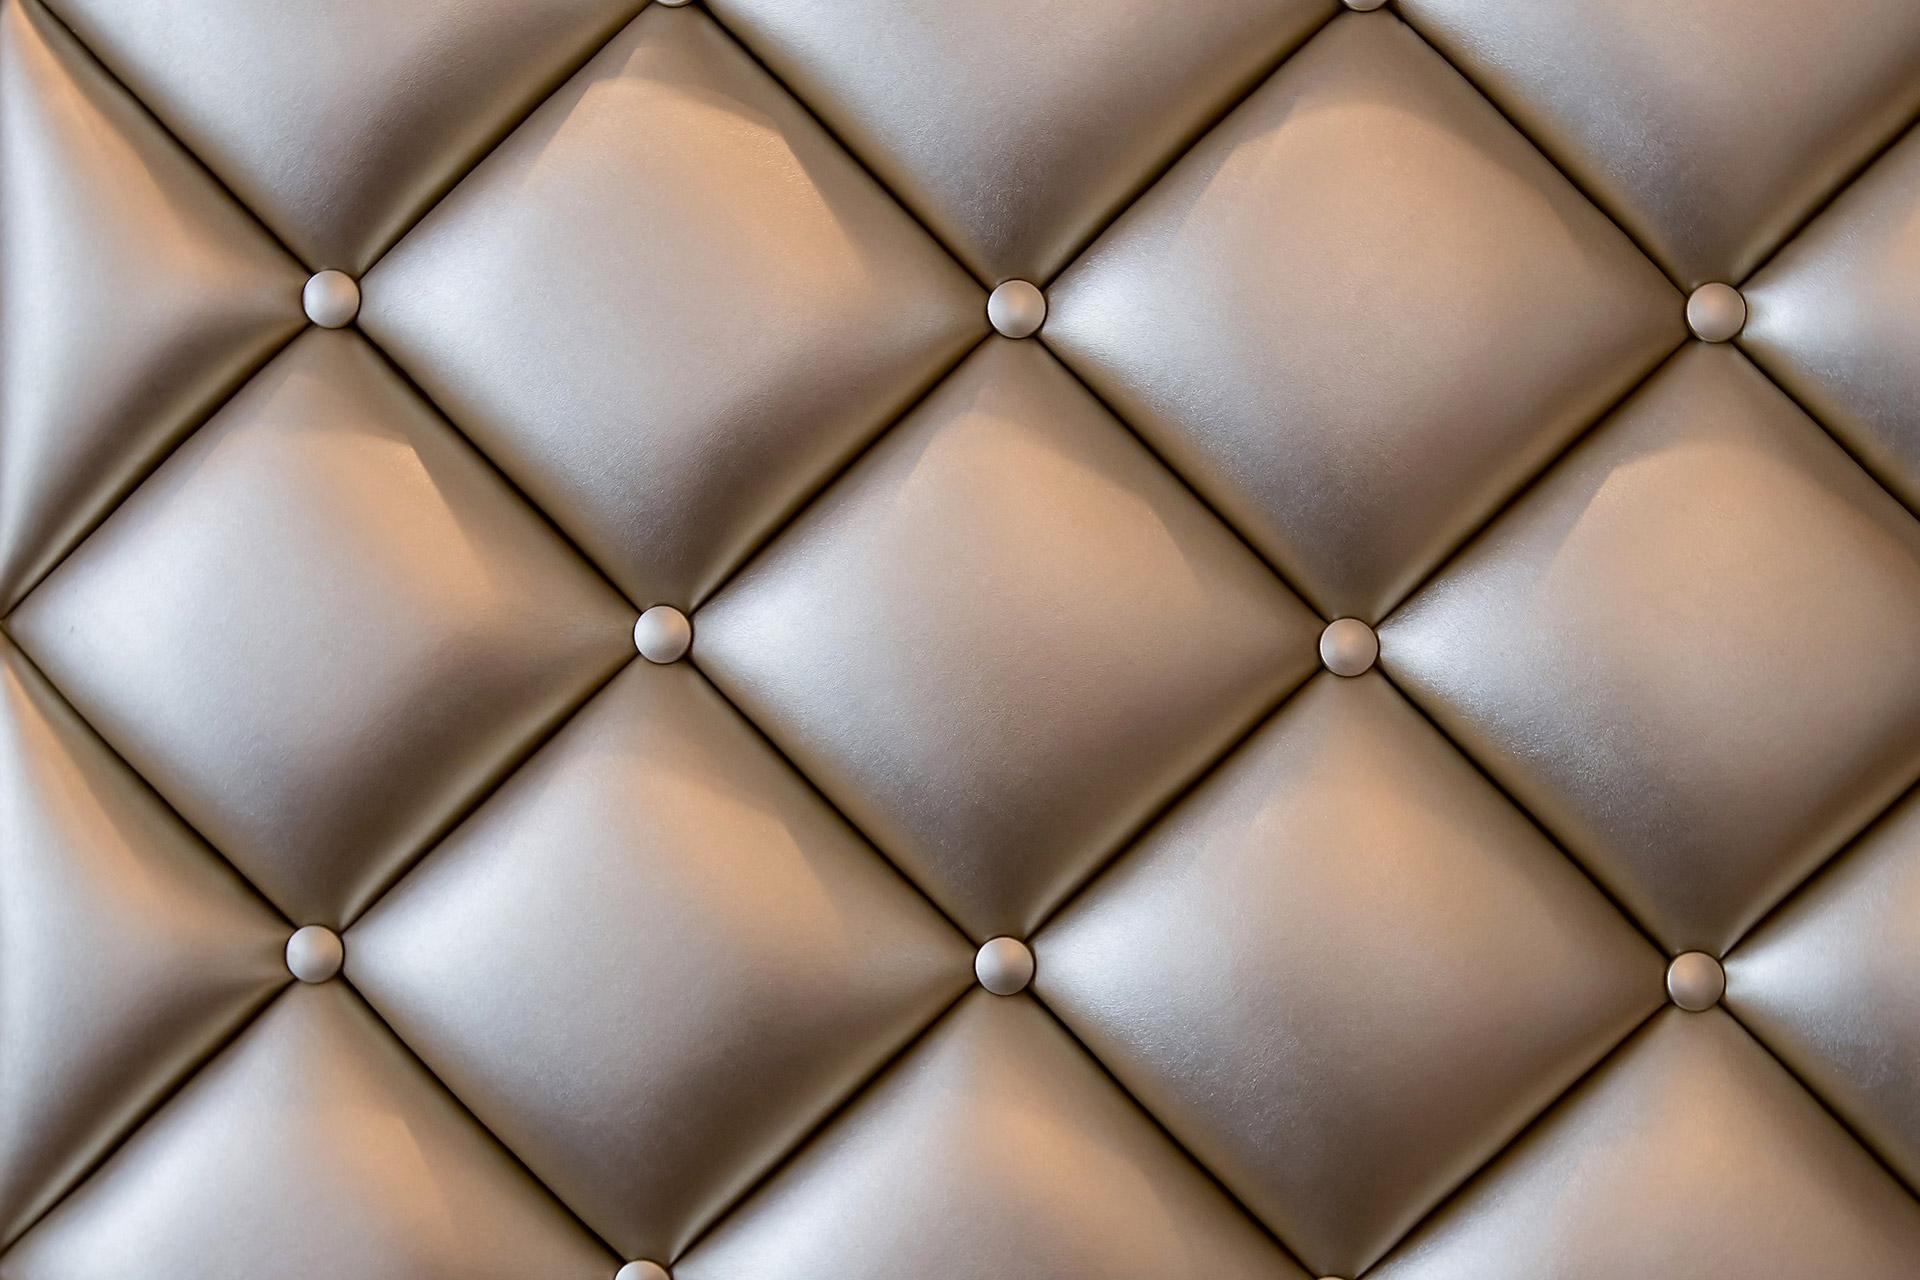 Close up of a felt cushion